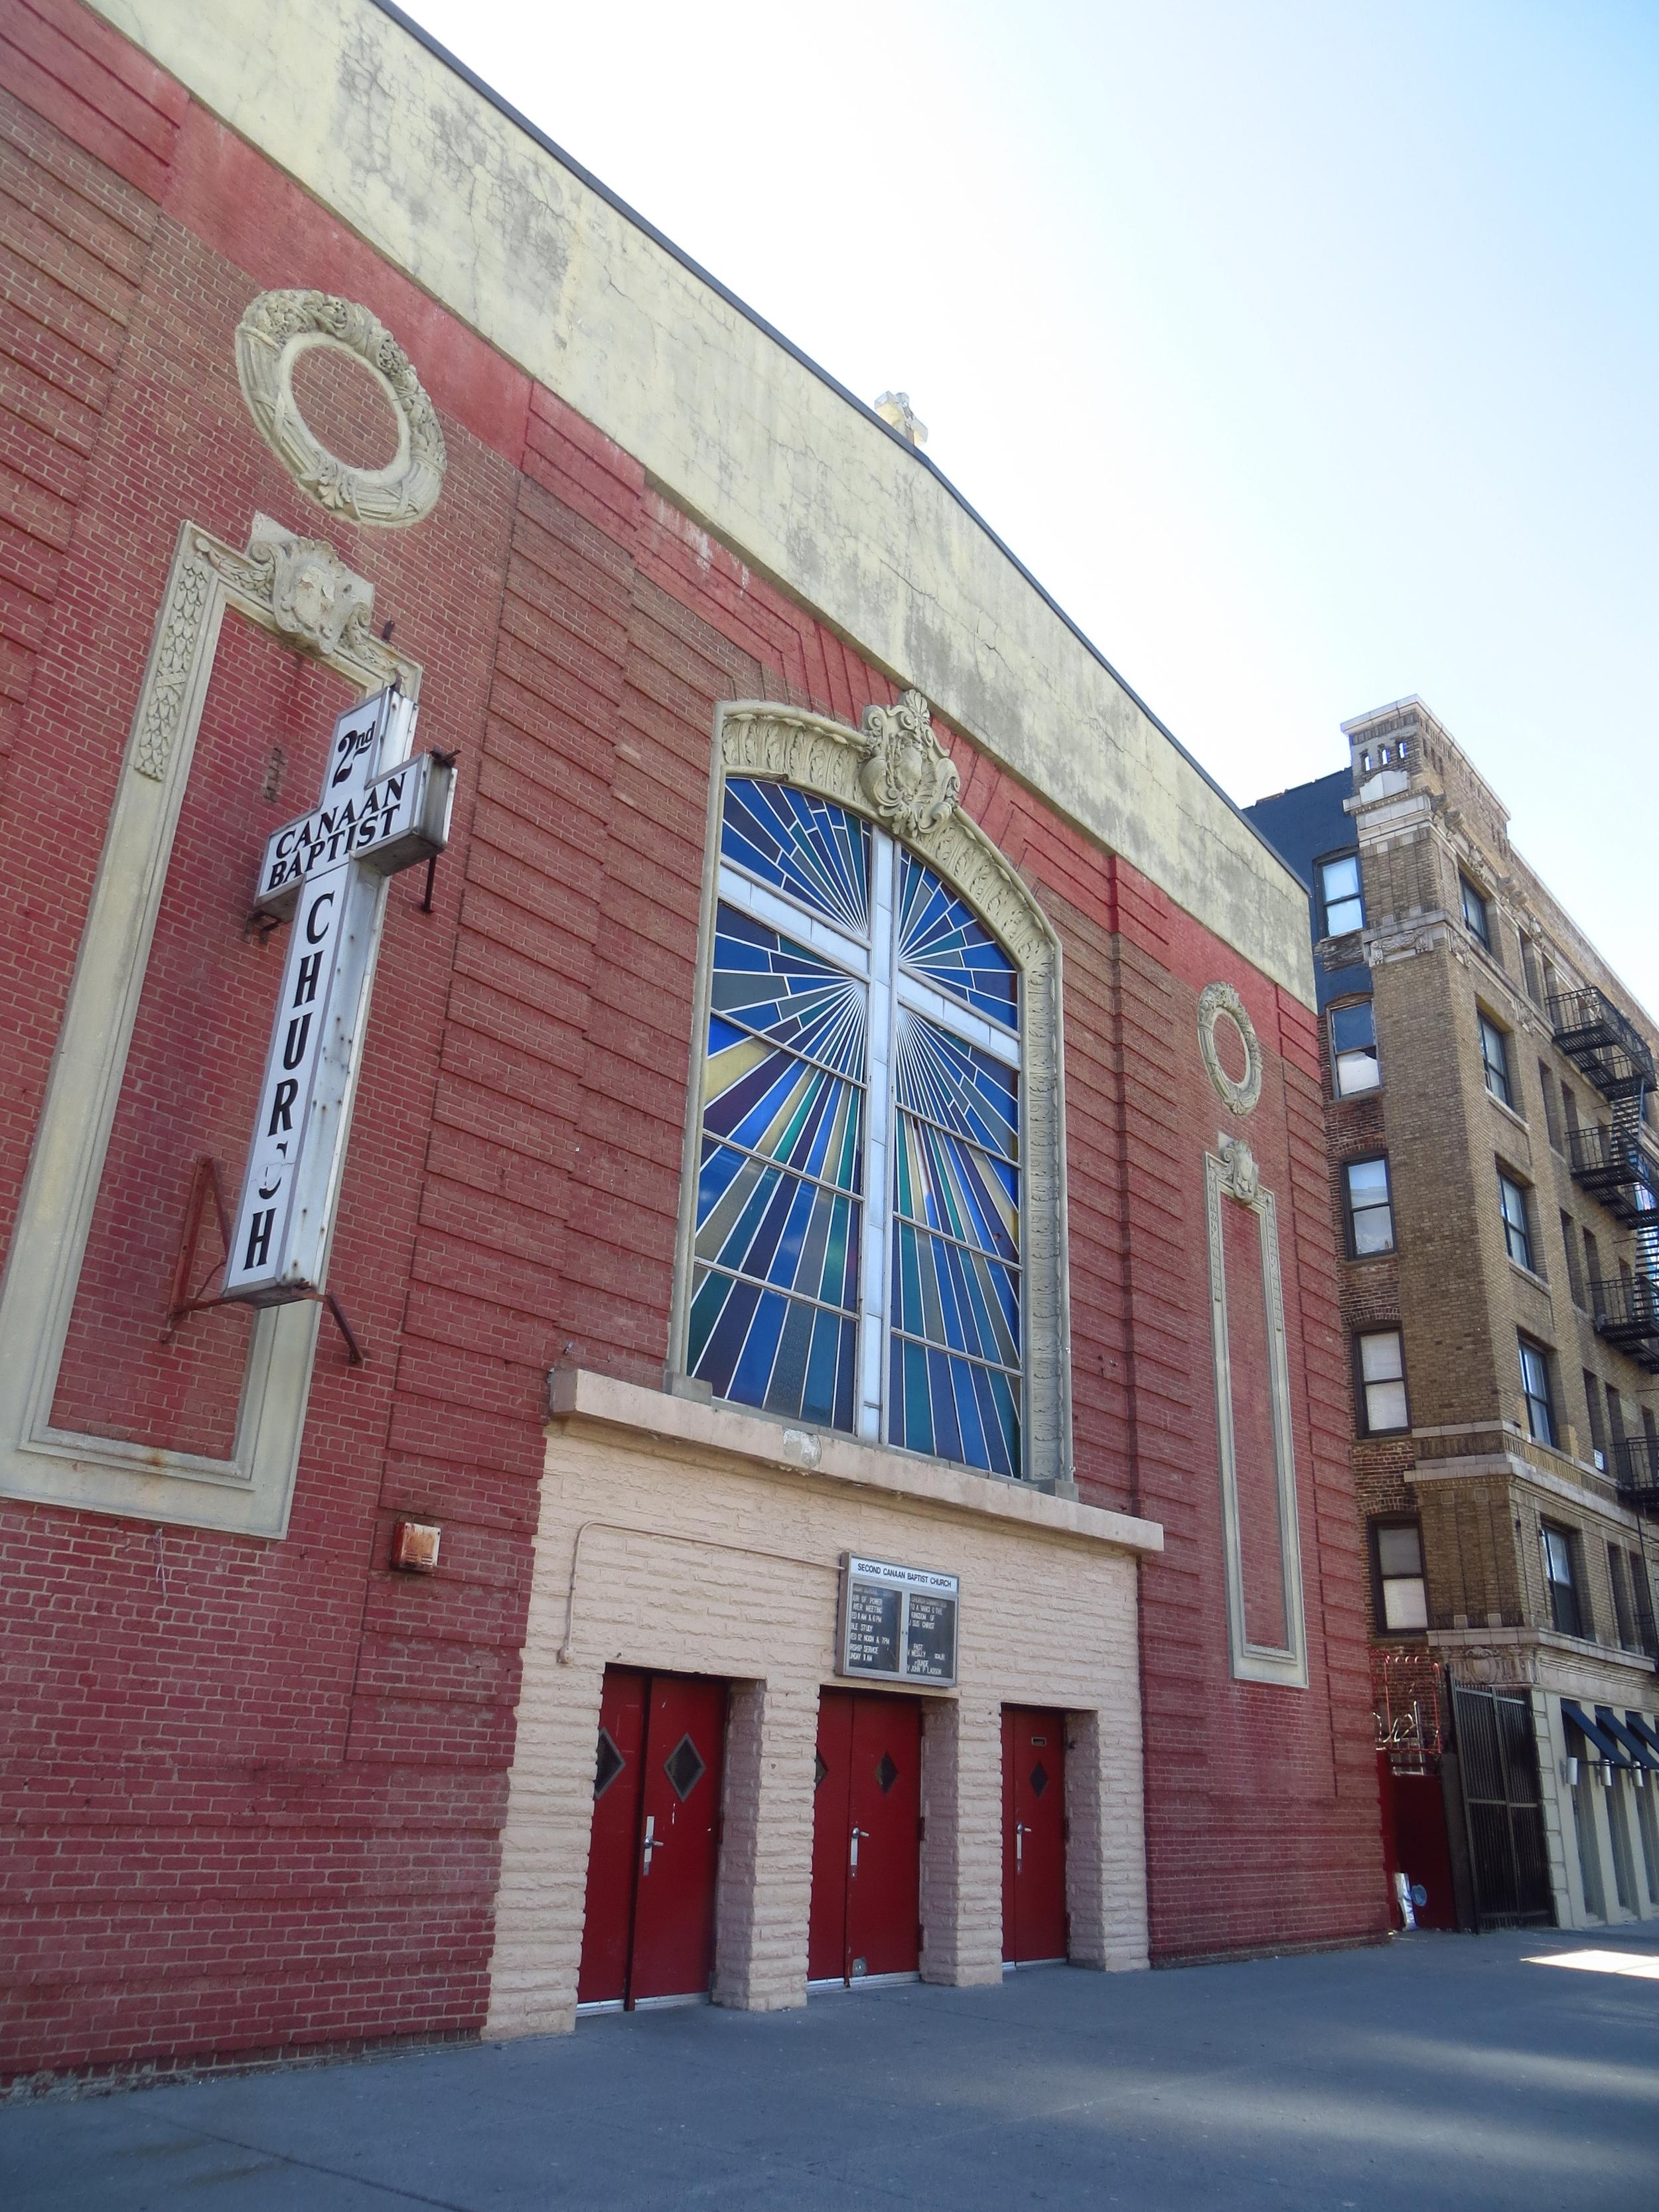 2nd Canaan Baptist Church